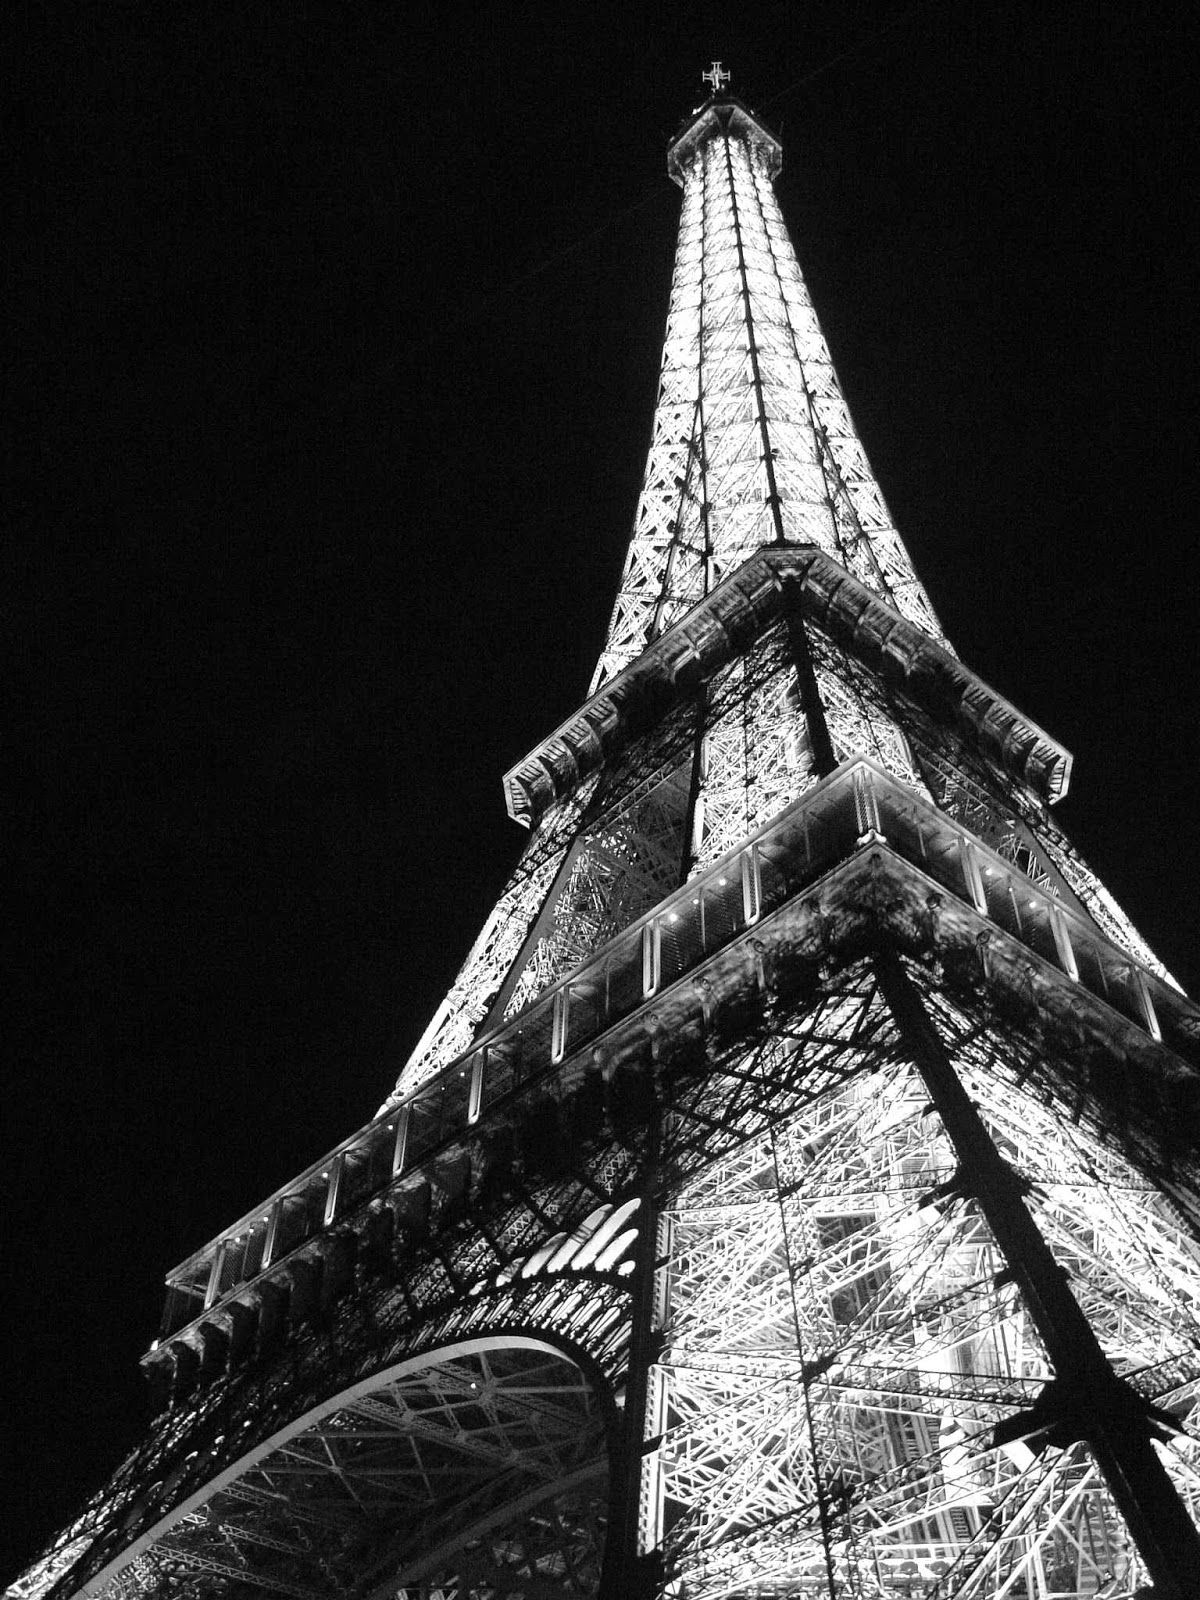 Eiffel Tower Paris at night Black and white Photo Paris